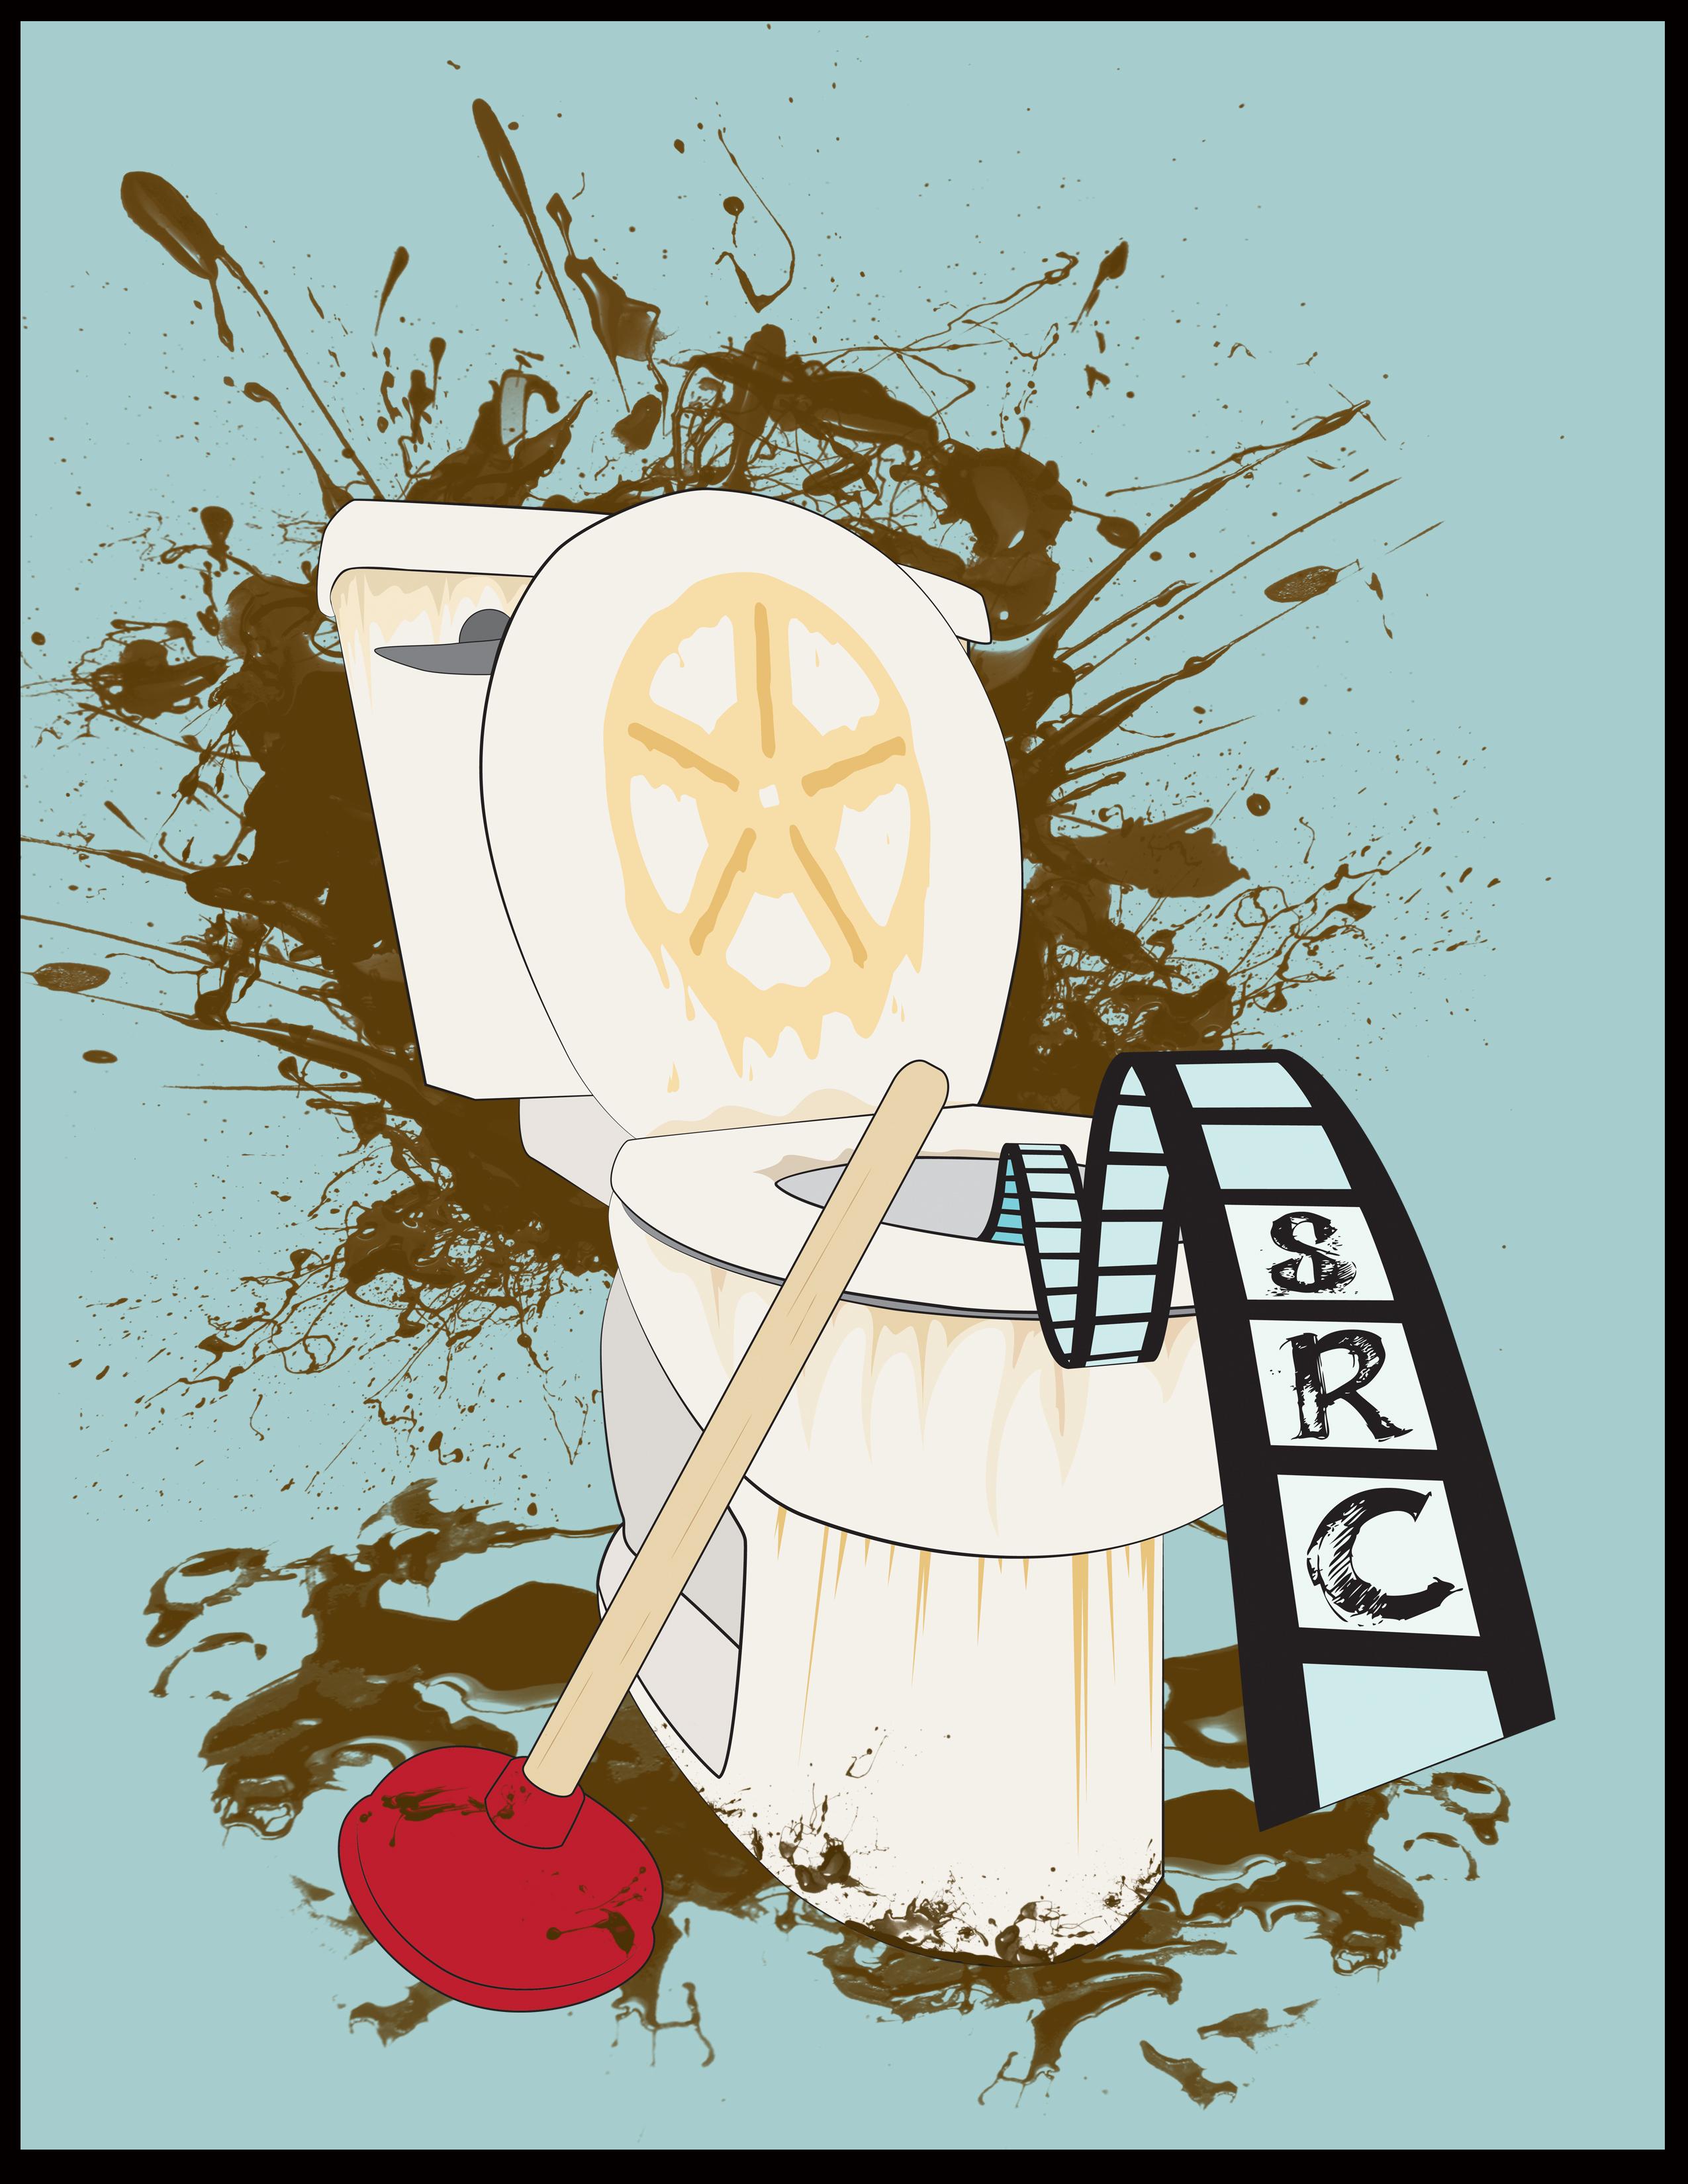 SRC Stall #26: Eyeborgs (2009)